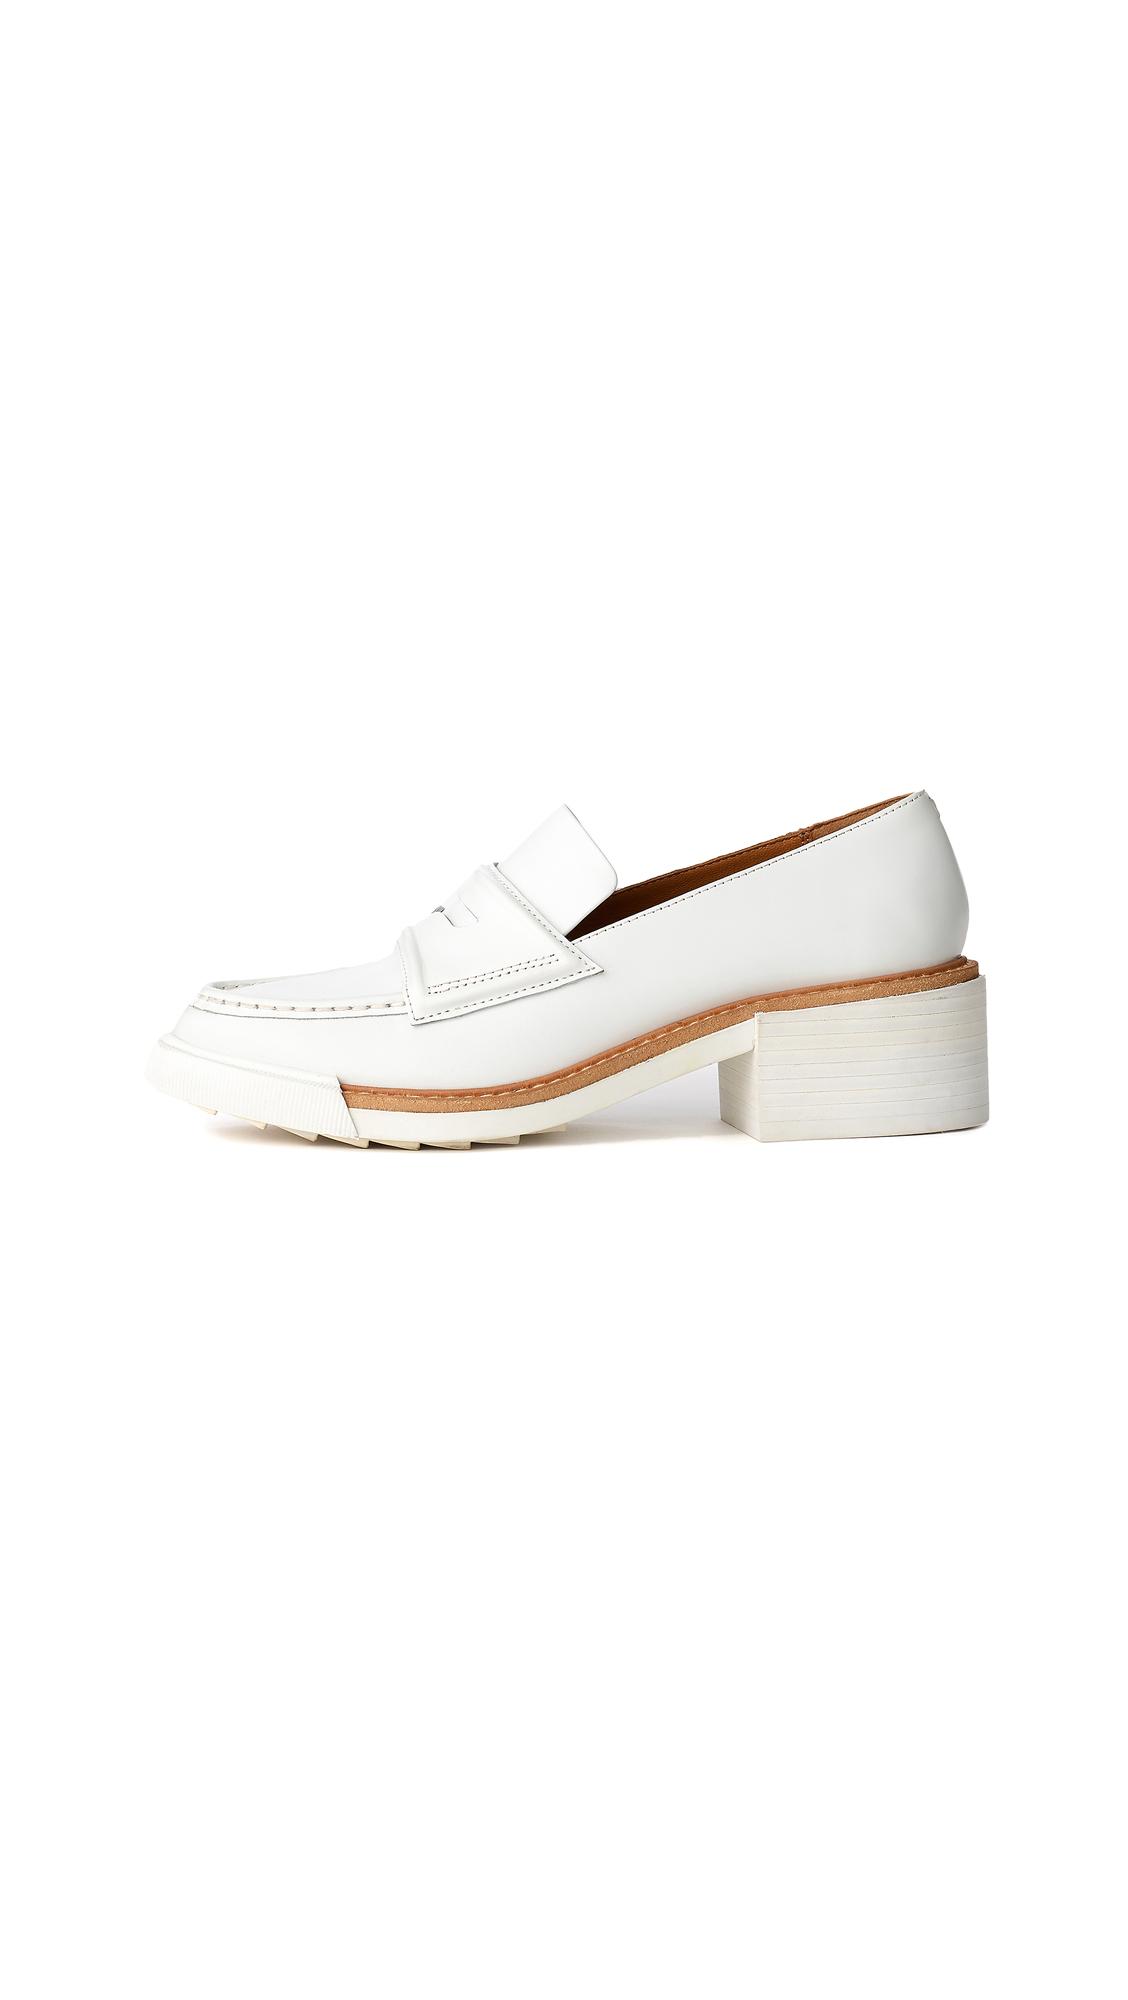 Rag & Bone Antor Loafers – 50% Off Sale